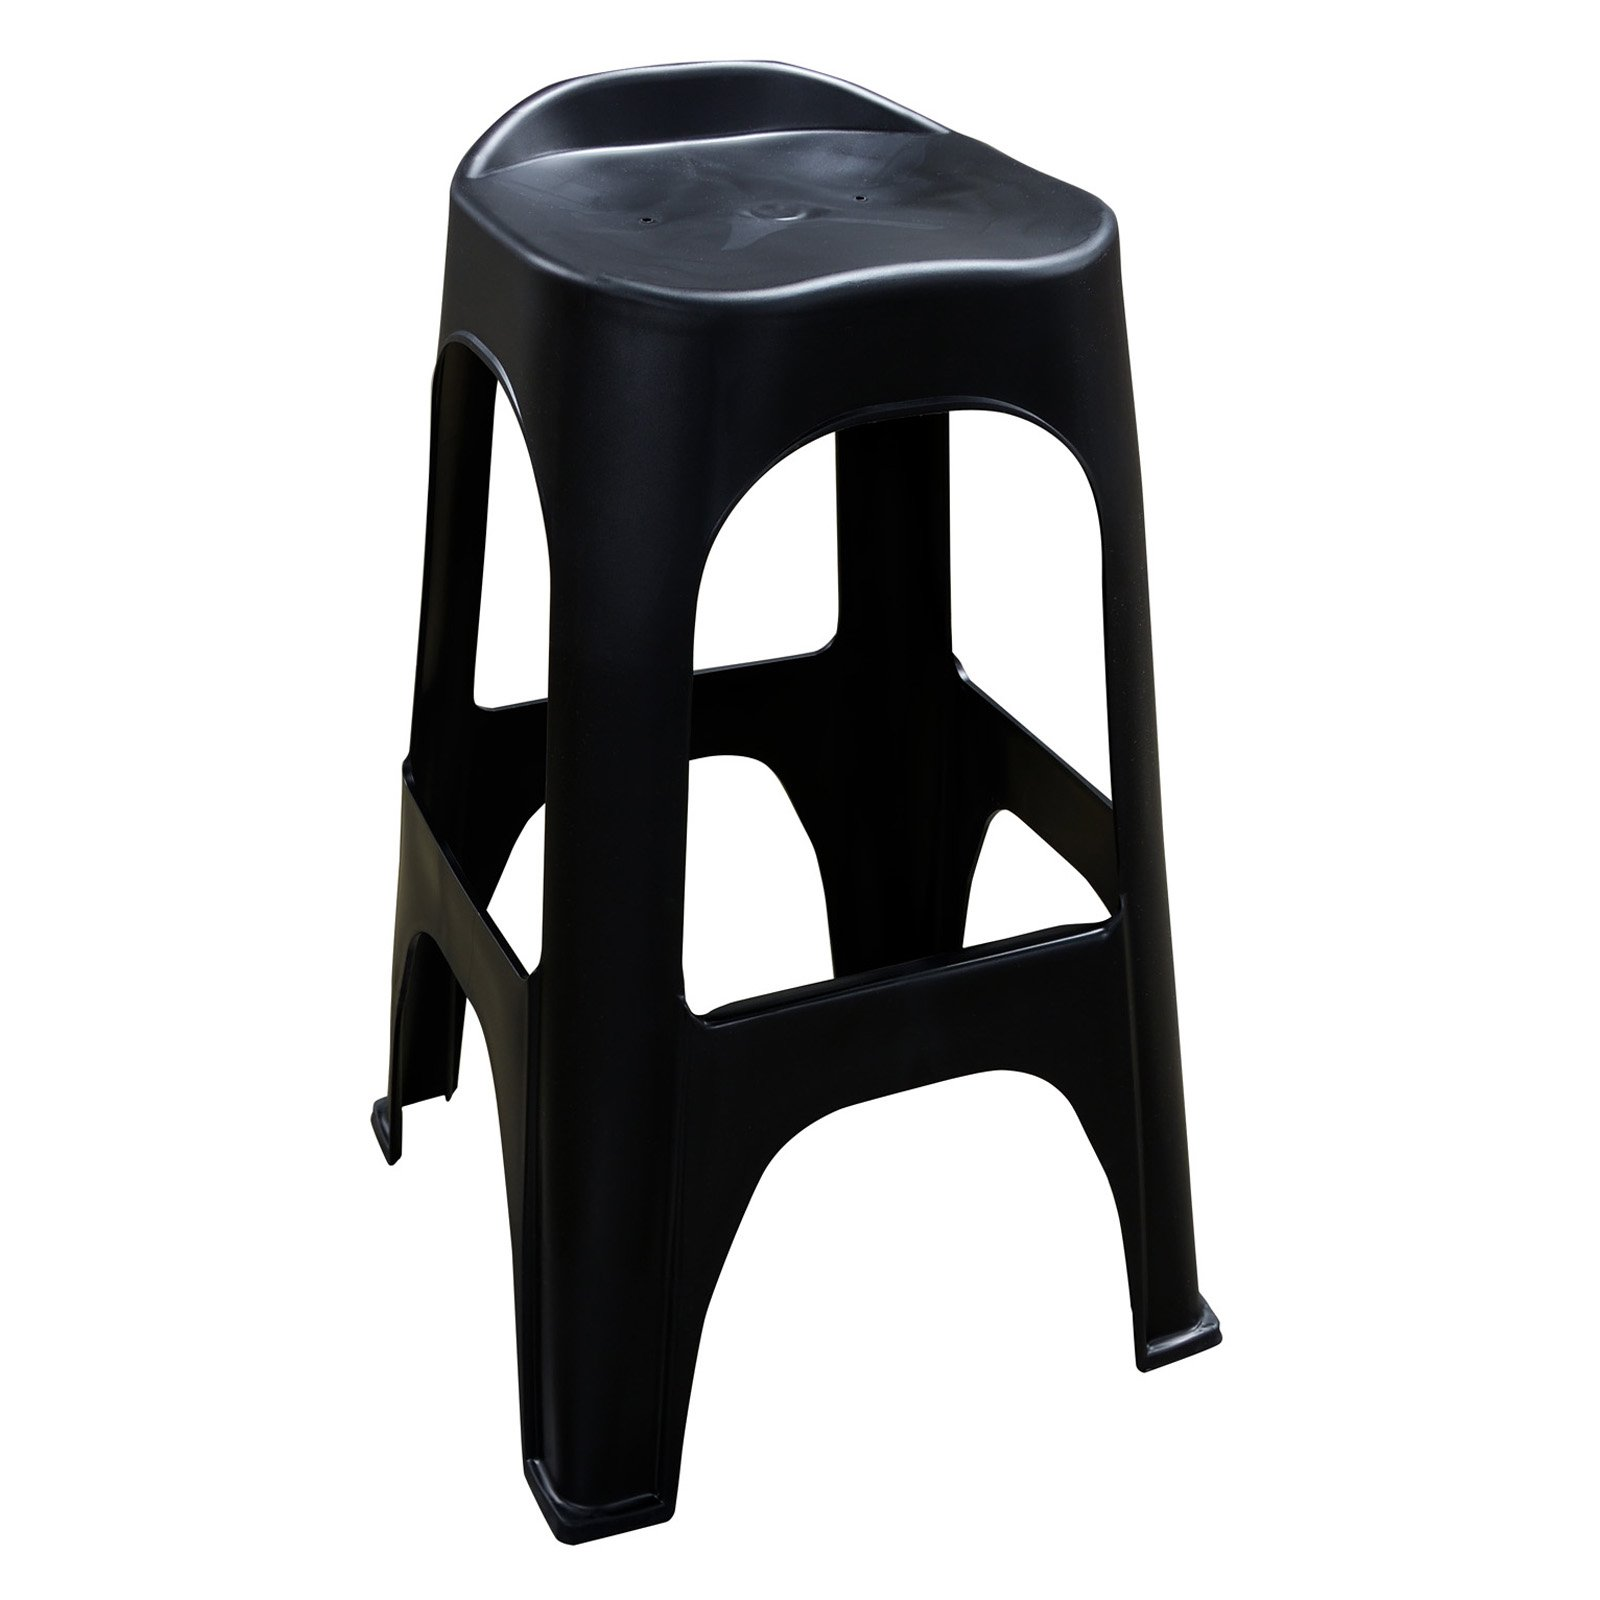 Image of Adams Manufacturing RealComfort Barstool, Black